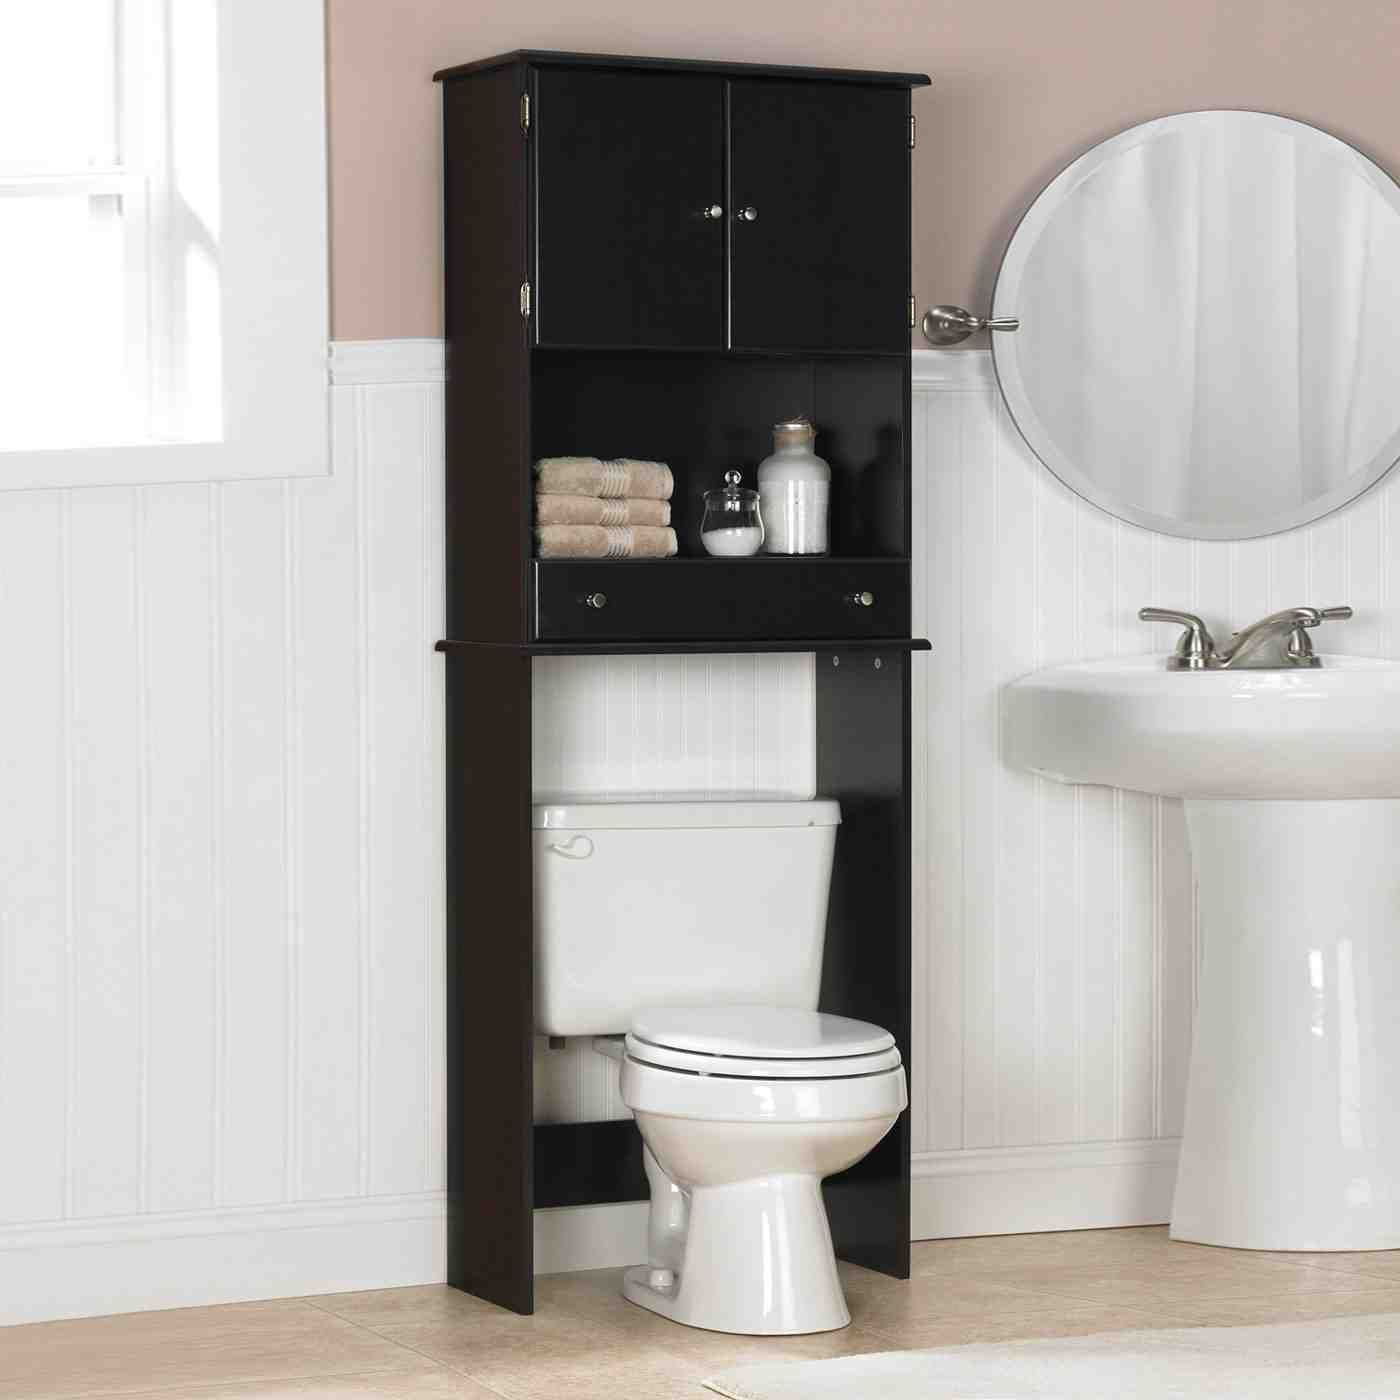 Black Bathroom Storage Cabinet Bathroom Shelf Decor Black Cabinets Bathroom Toilet Storage